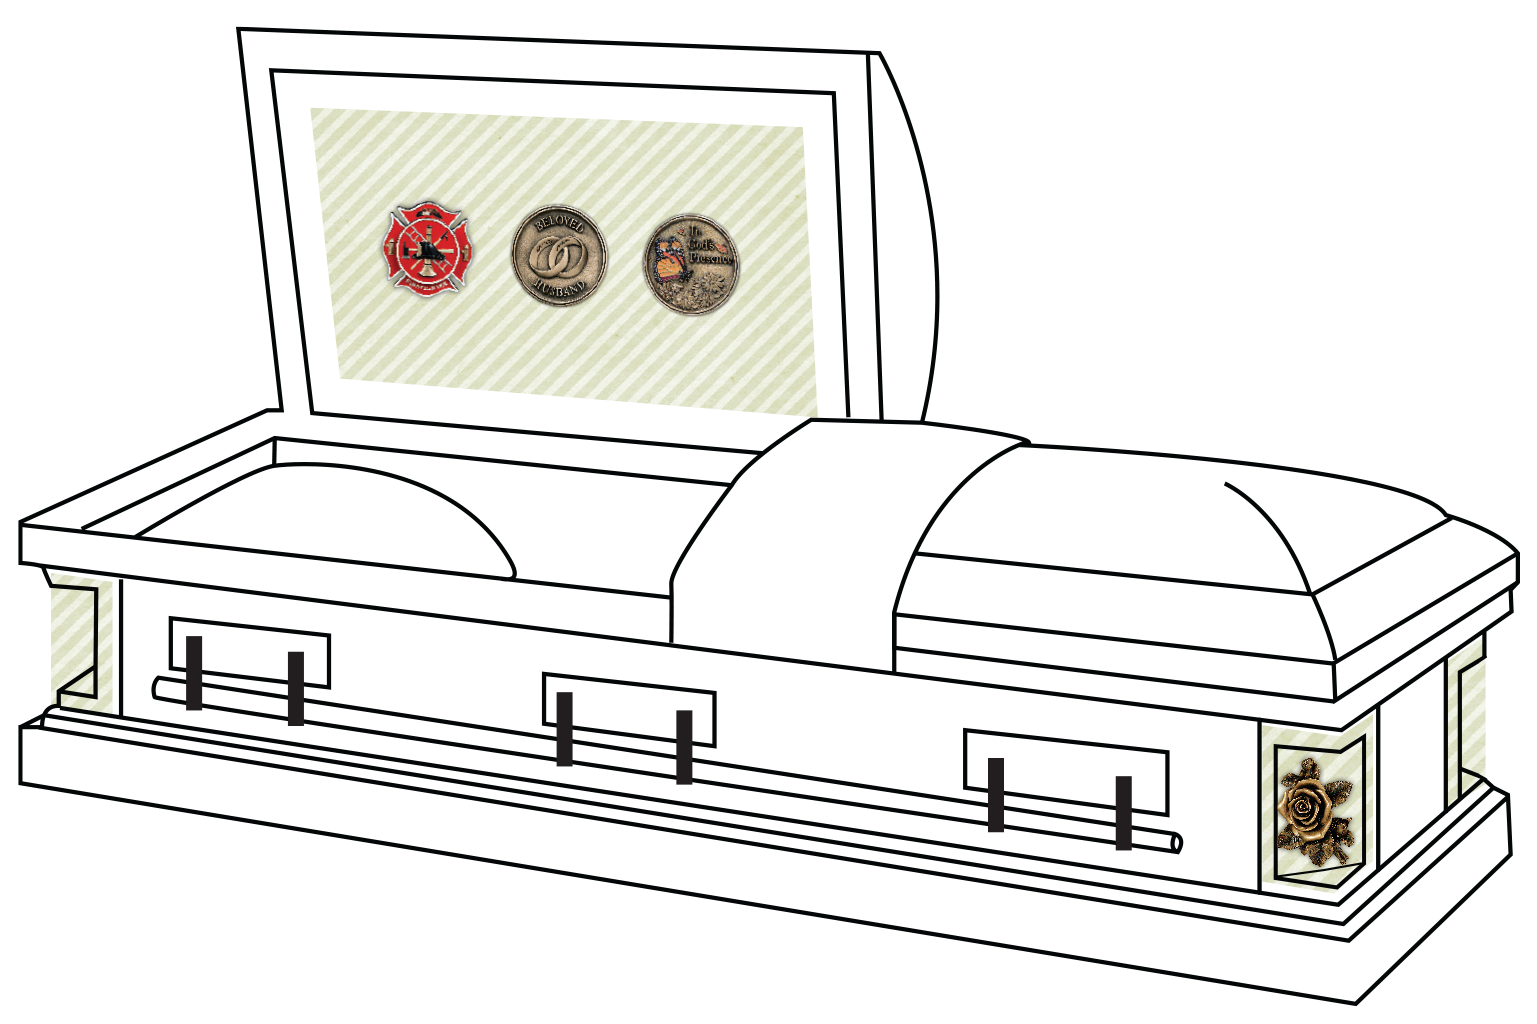 Funeral clipart coffin funeral. Batesville casket commemorative caskets